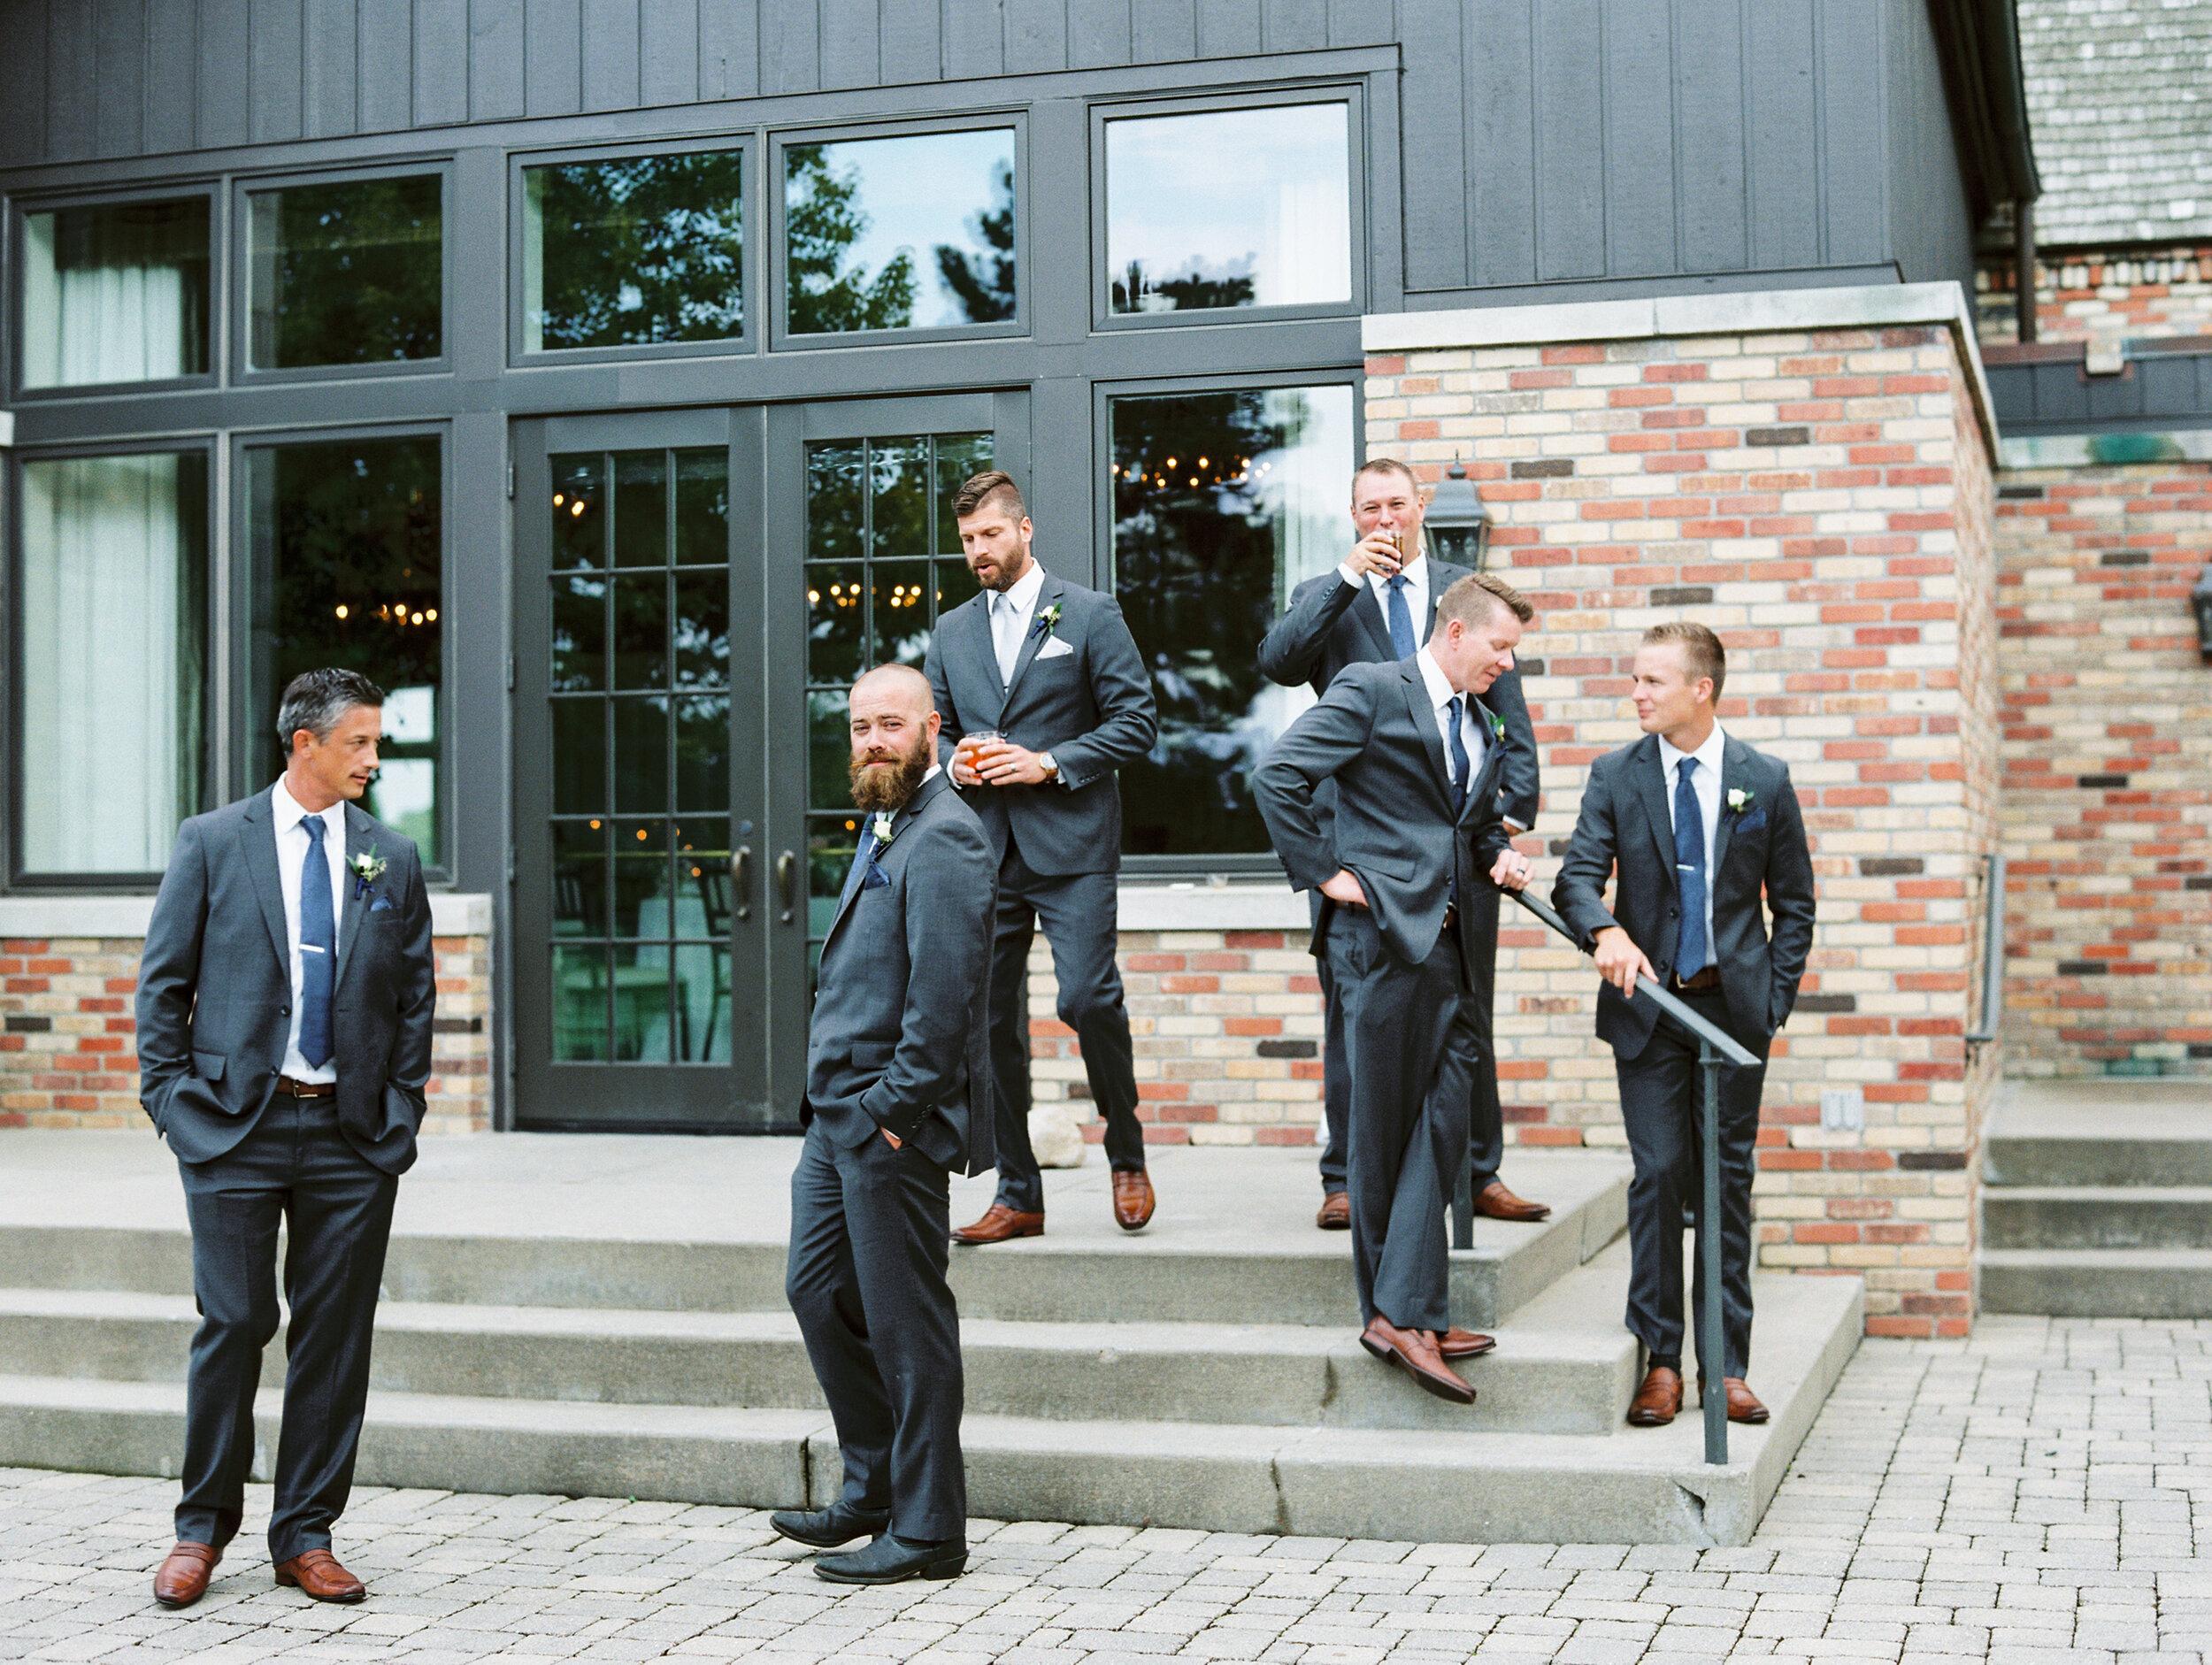 Kuiper+Wedding+Reception+Bridal+Party-110.jpg